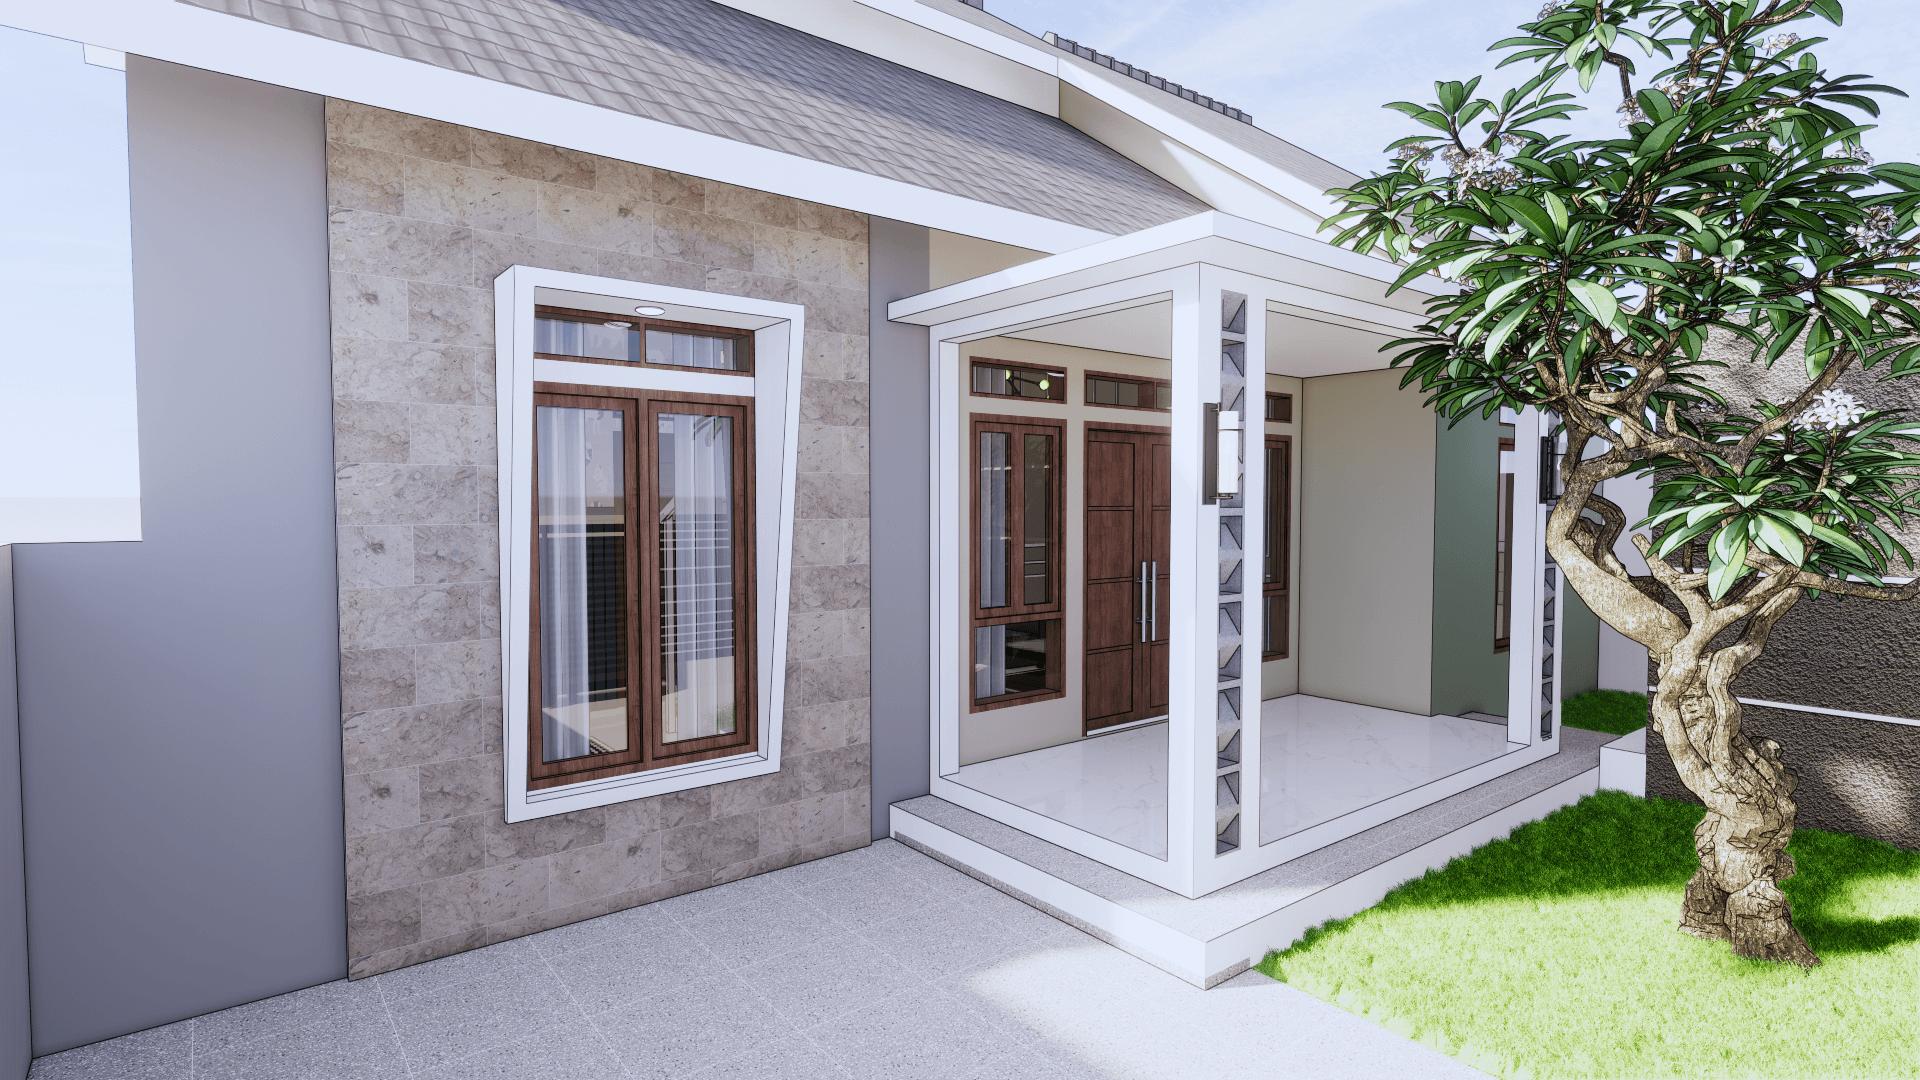 Jasa Design and Build Lukmanul Hakim di Subang